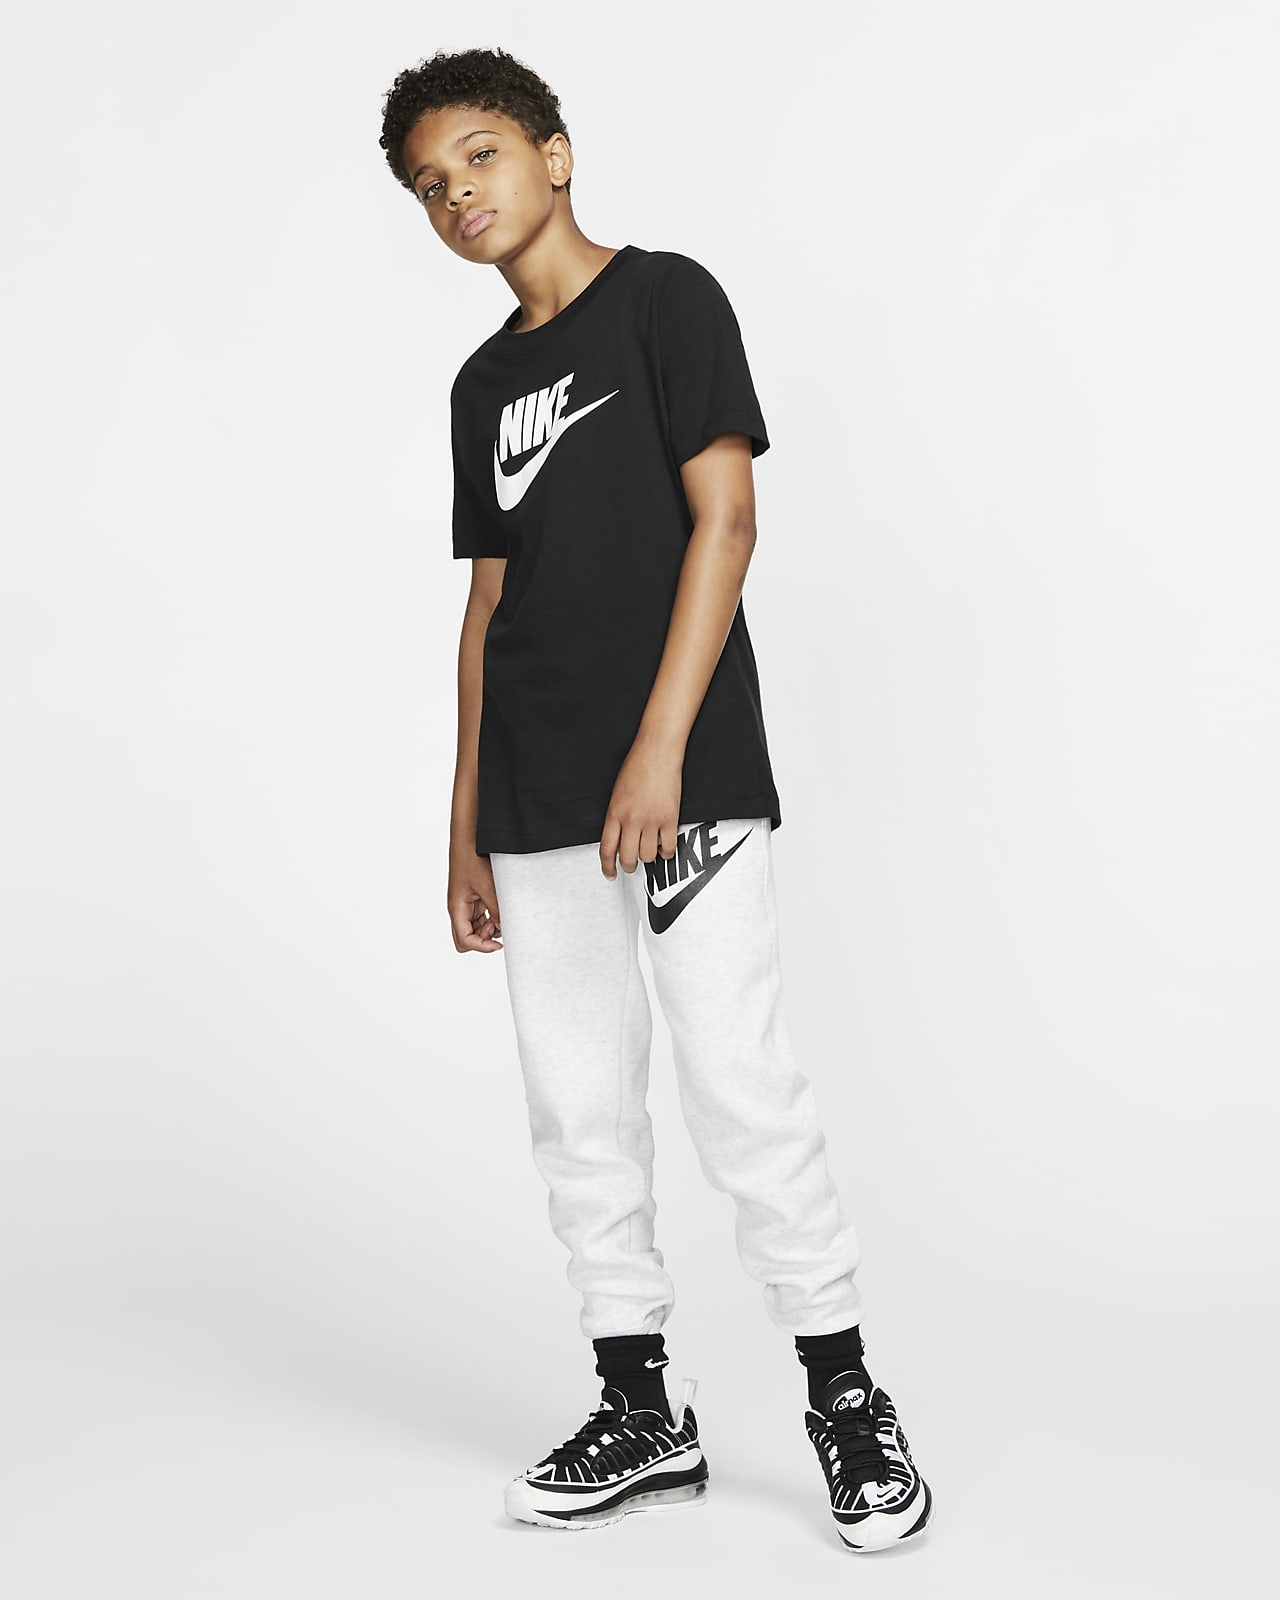 Fanático popurrí Maligno  Nike Sportswear Club Fleece Older Kids' (Boys') Trousers. Nike SA